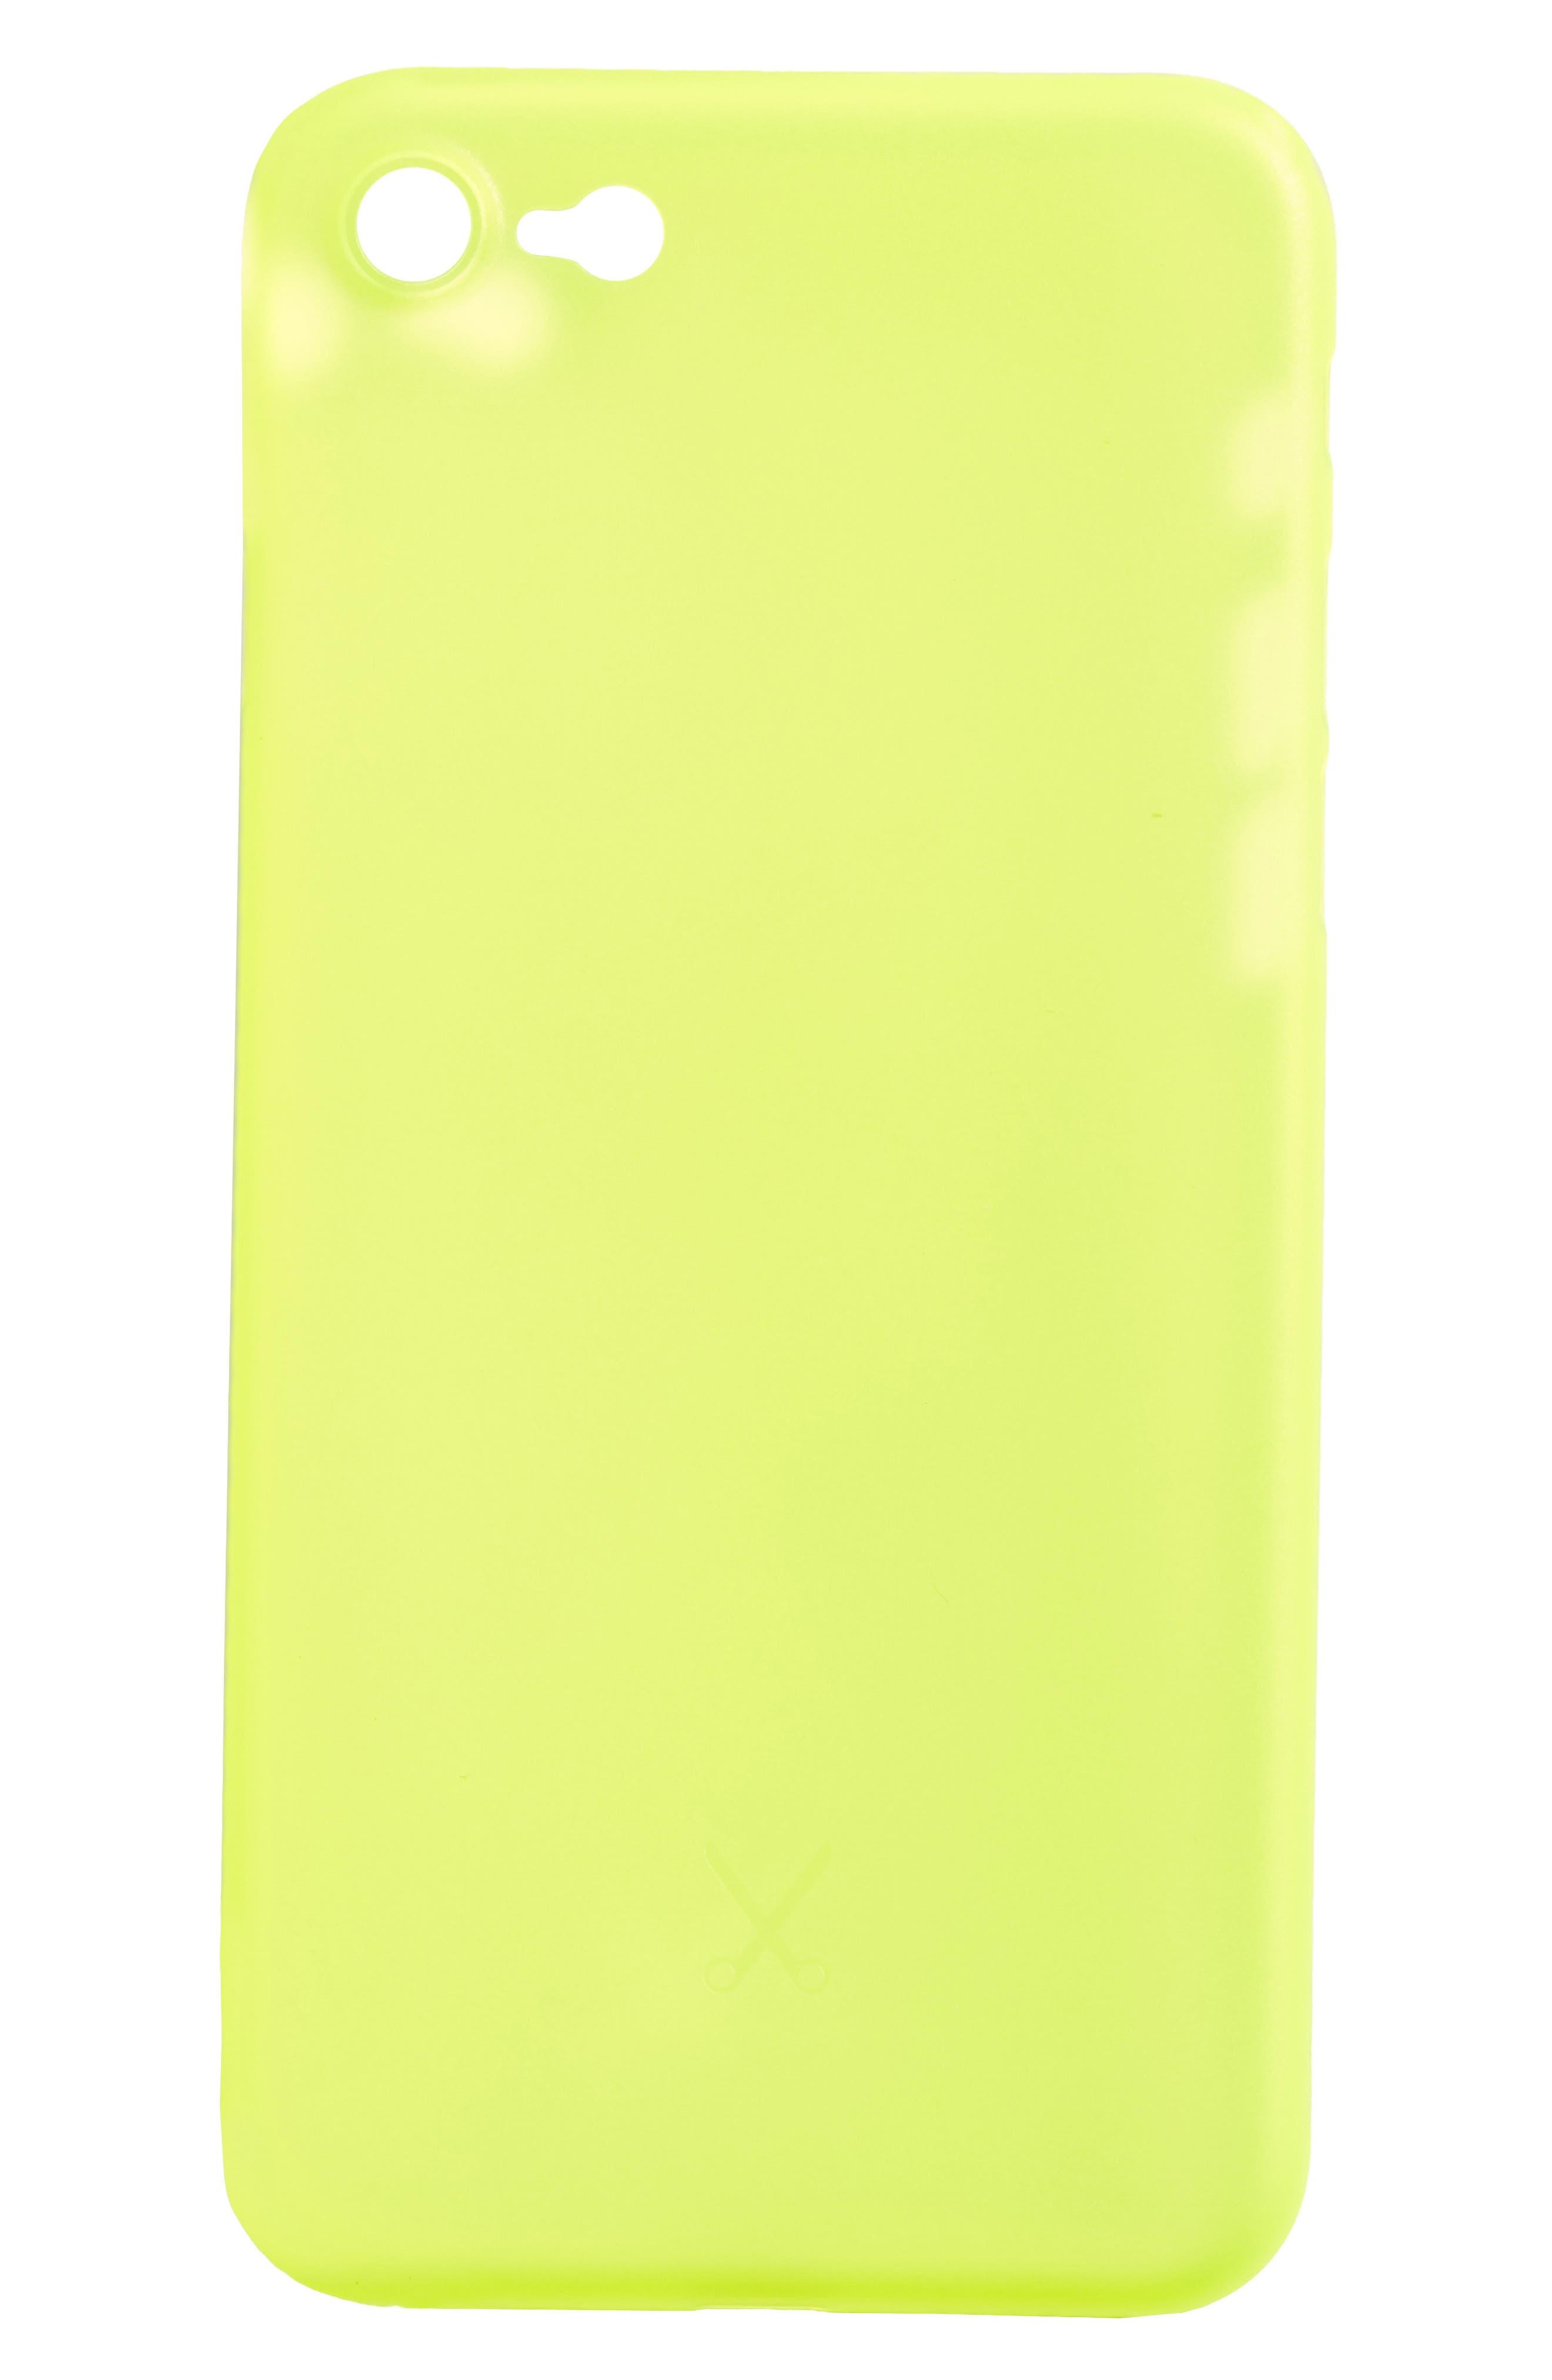 PHILO Tech Ultra Thin iPhone 7 Case